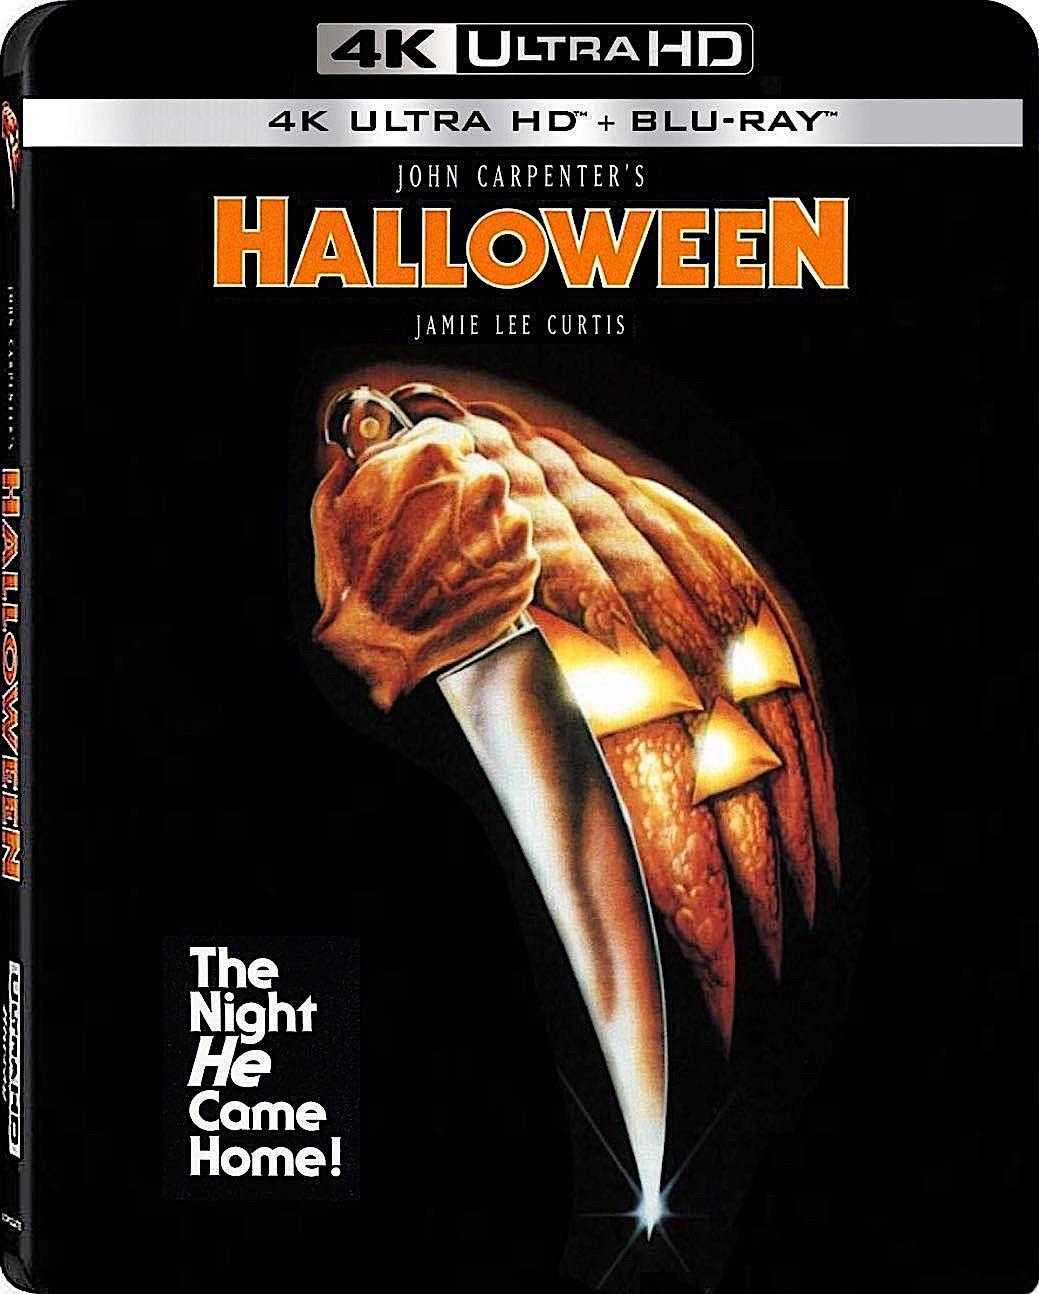 HALLOWEEN 4K BLURAY (LIONSGATE) Halloween dvd